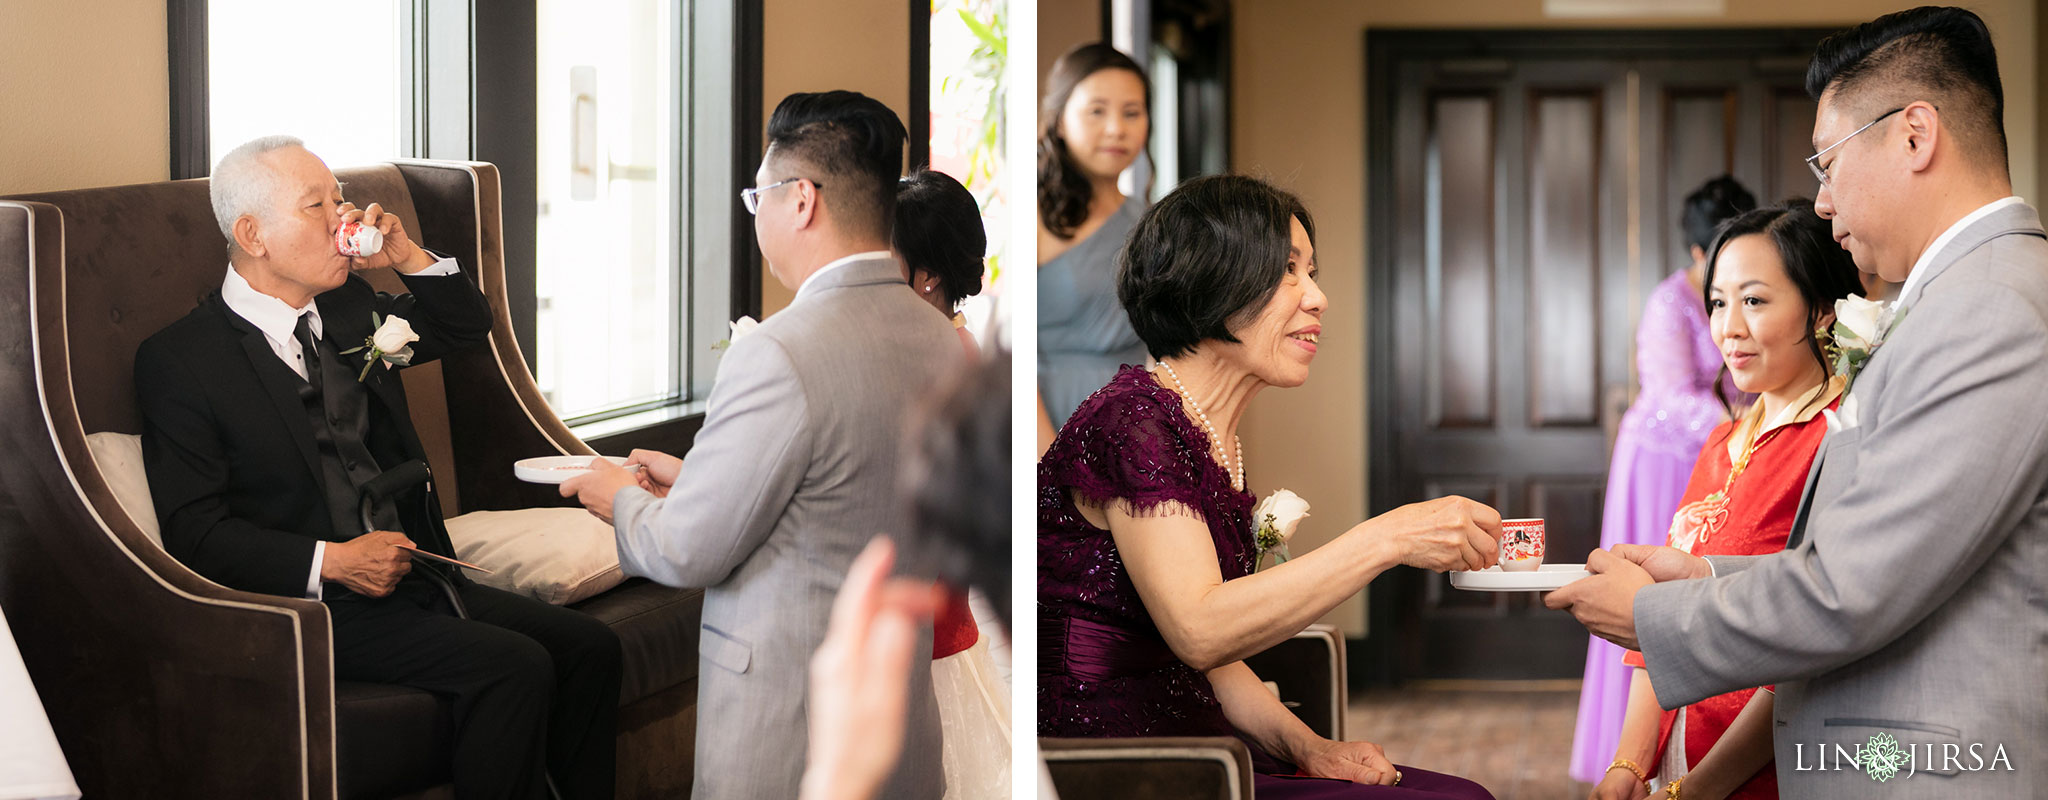 13 westridge golf club la habra tea ceremony wedding photography